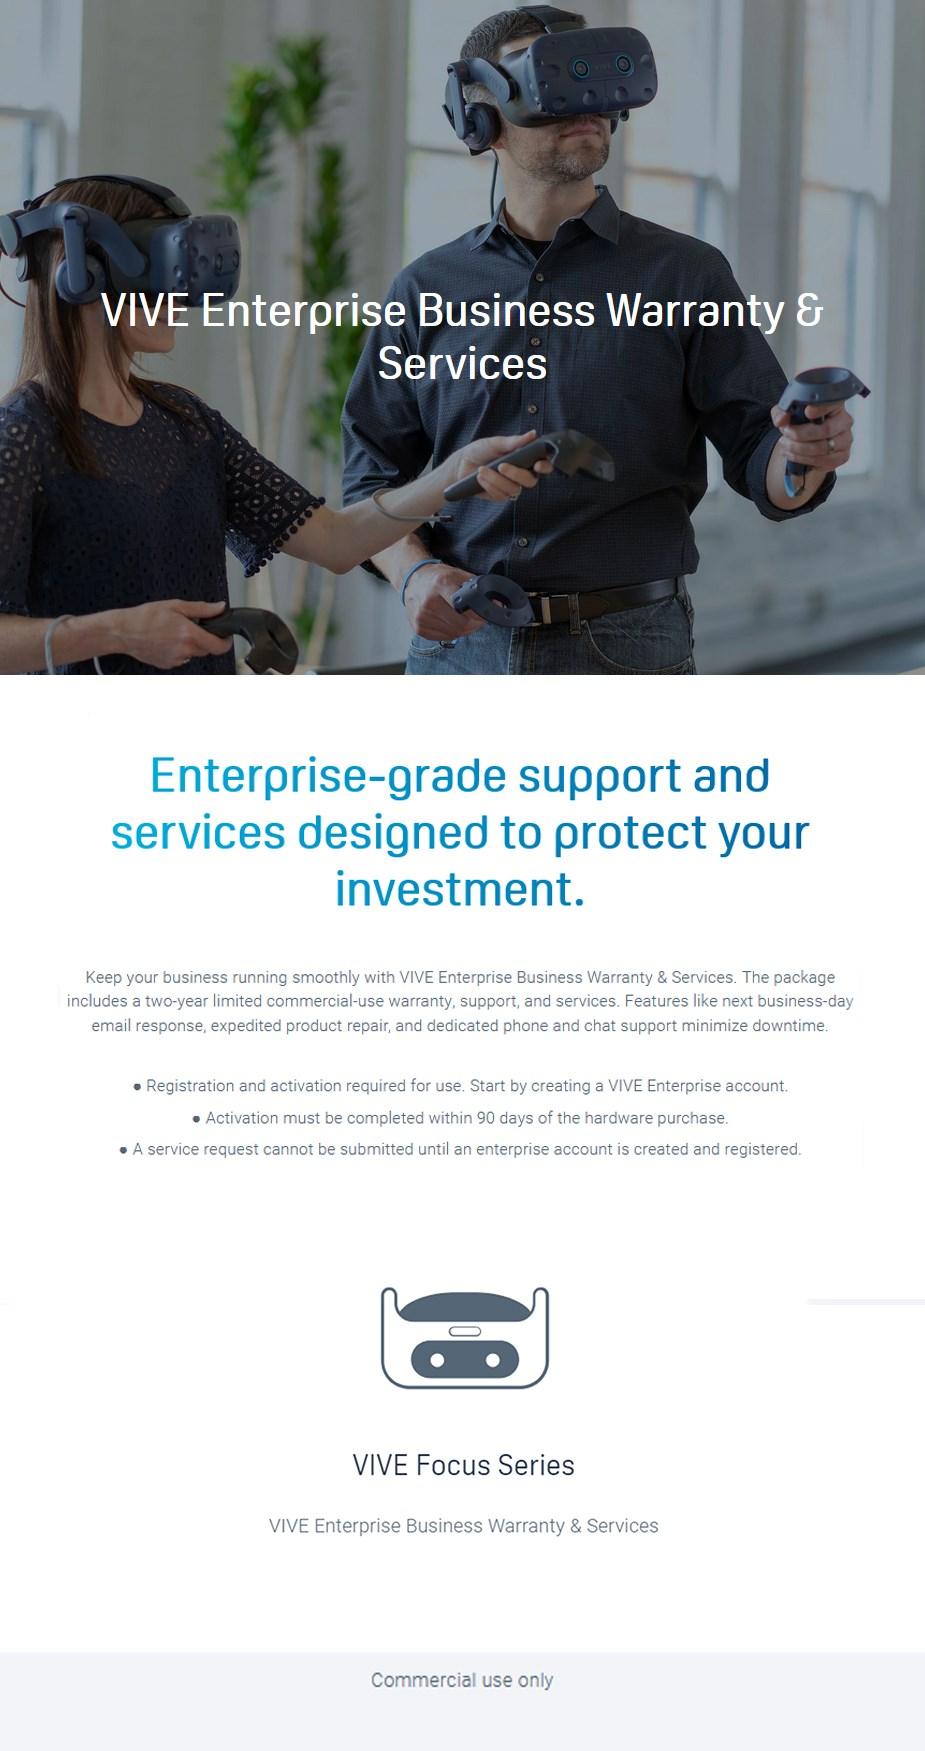 HTC Advantage Enterprise Care Package for VIVE Focus Series - For Commercial Use - Desktop Overview 1